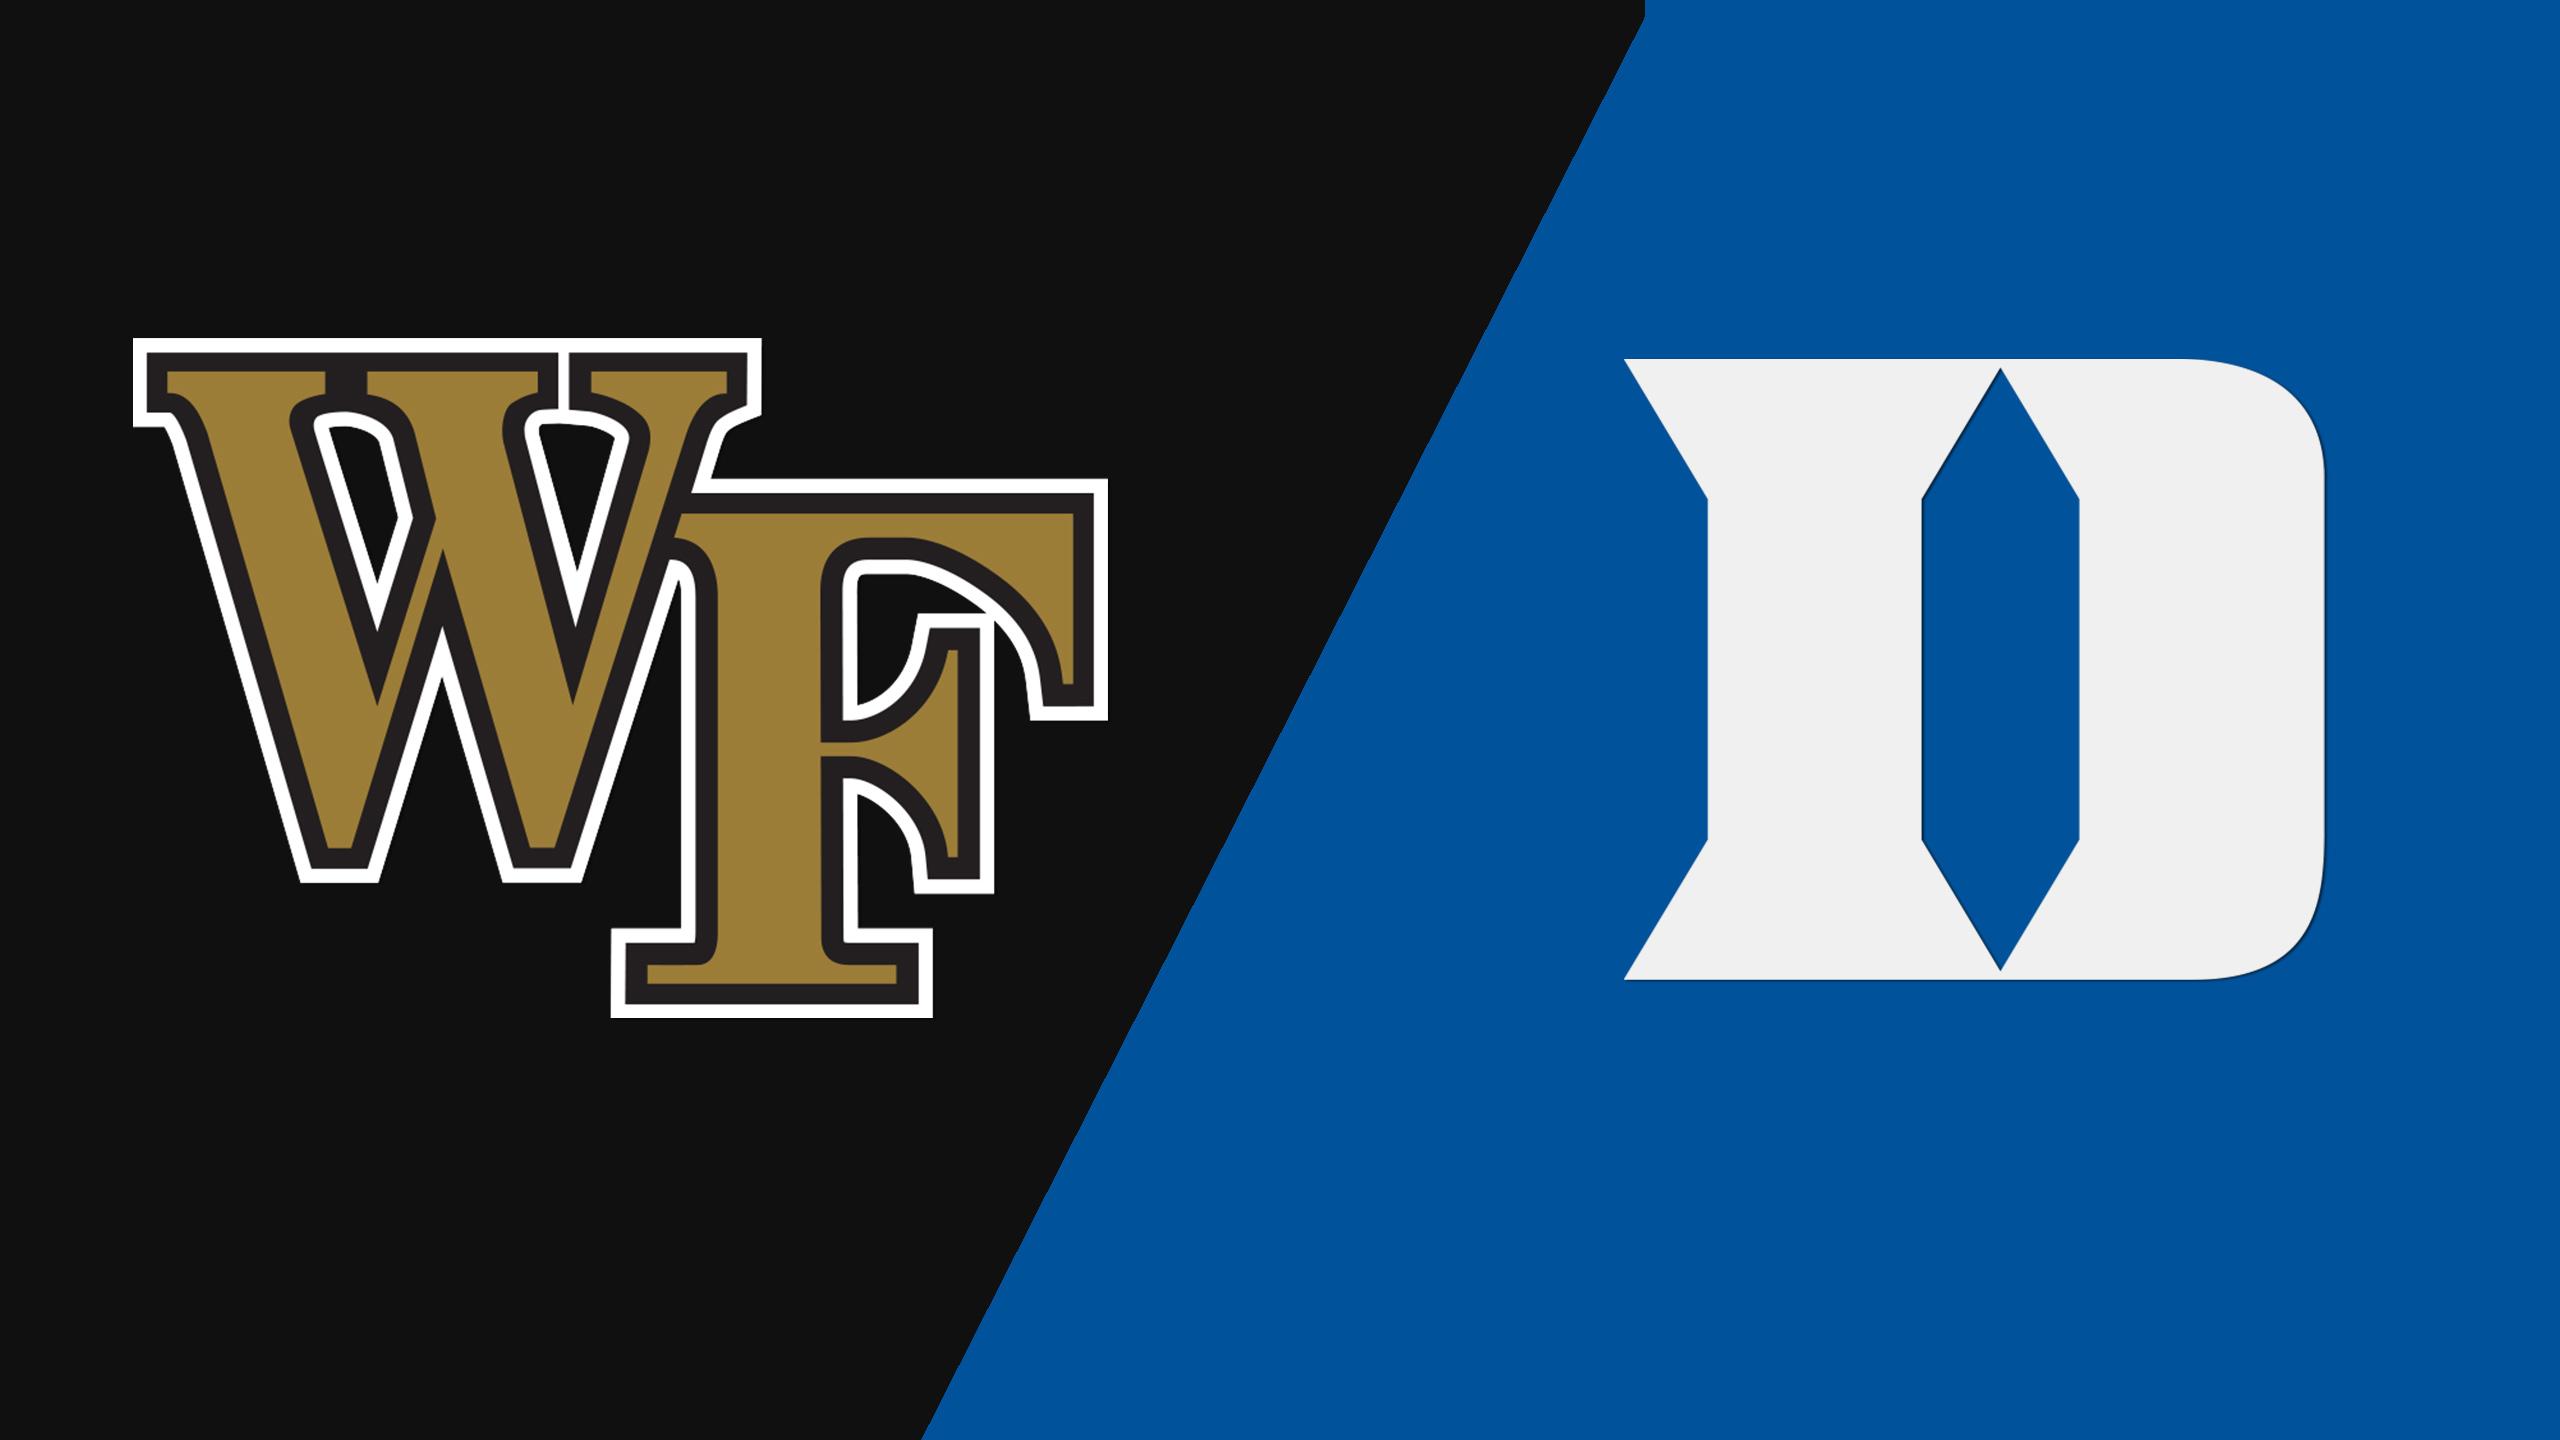 Wake Forest vs. Duke